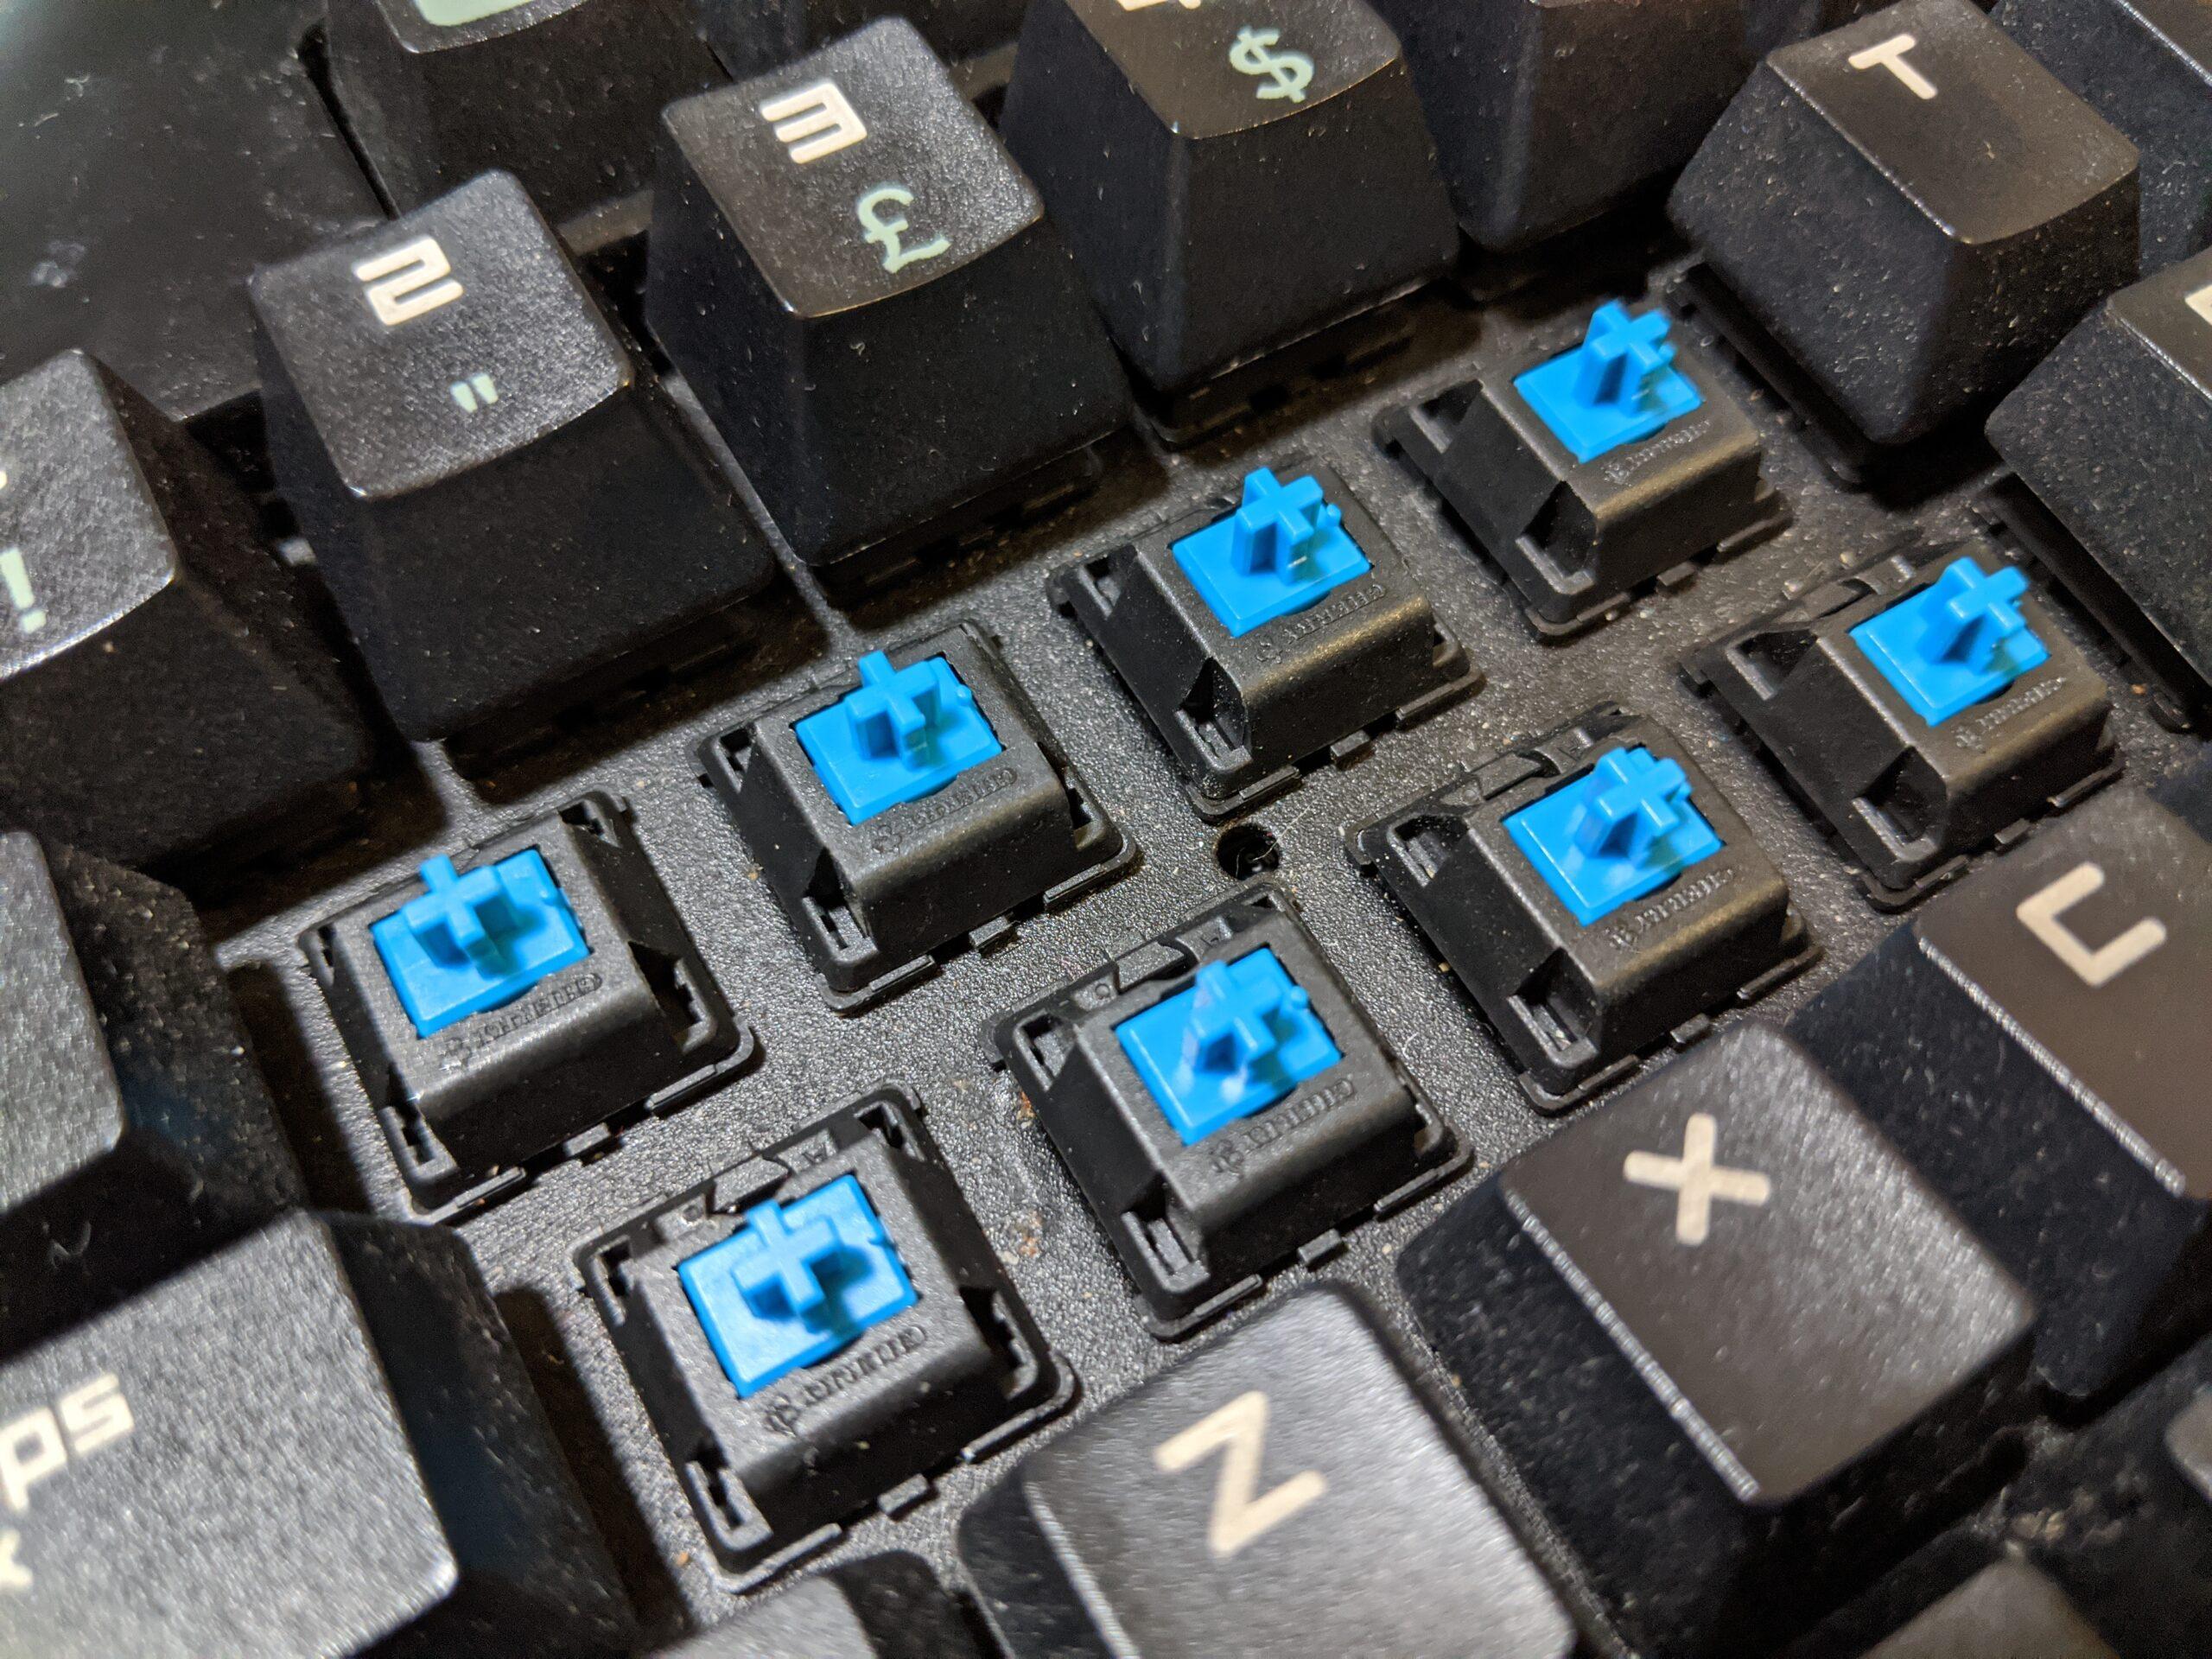 Cherry MX Blue switches